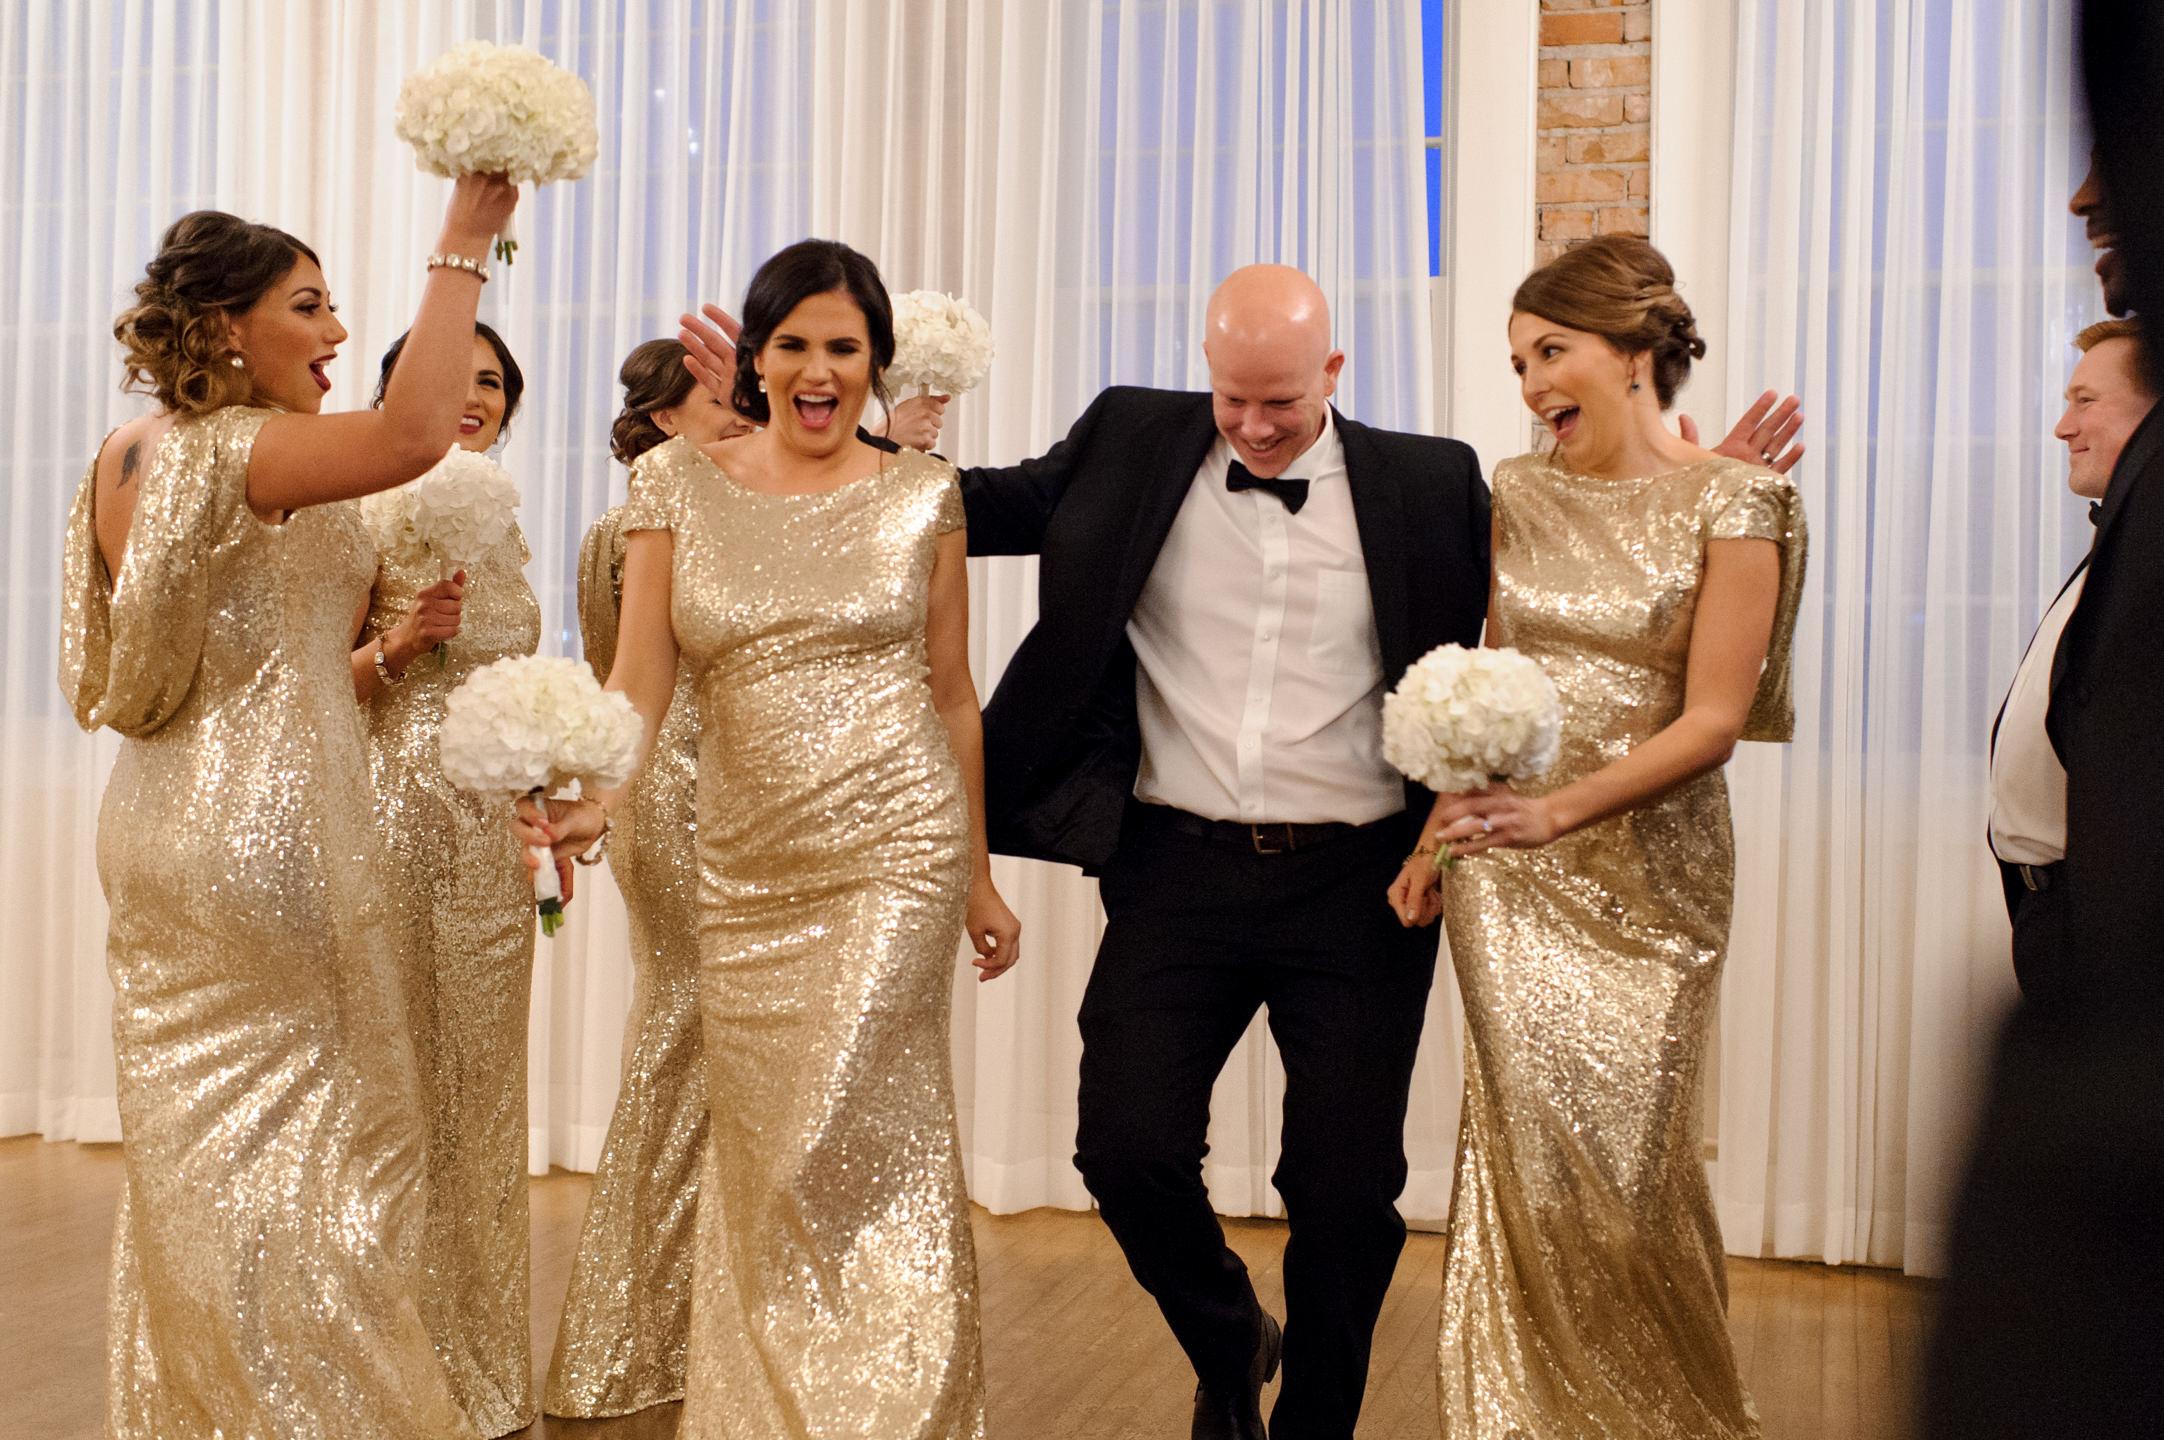 20161231_Tat_Marian and Joe Wedding-33.jpg